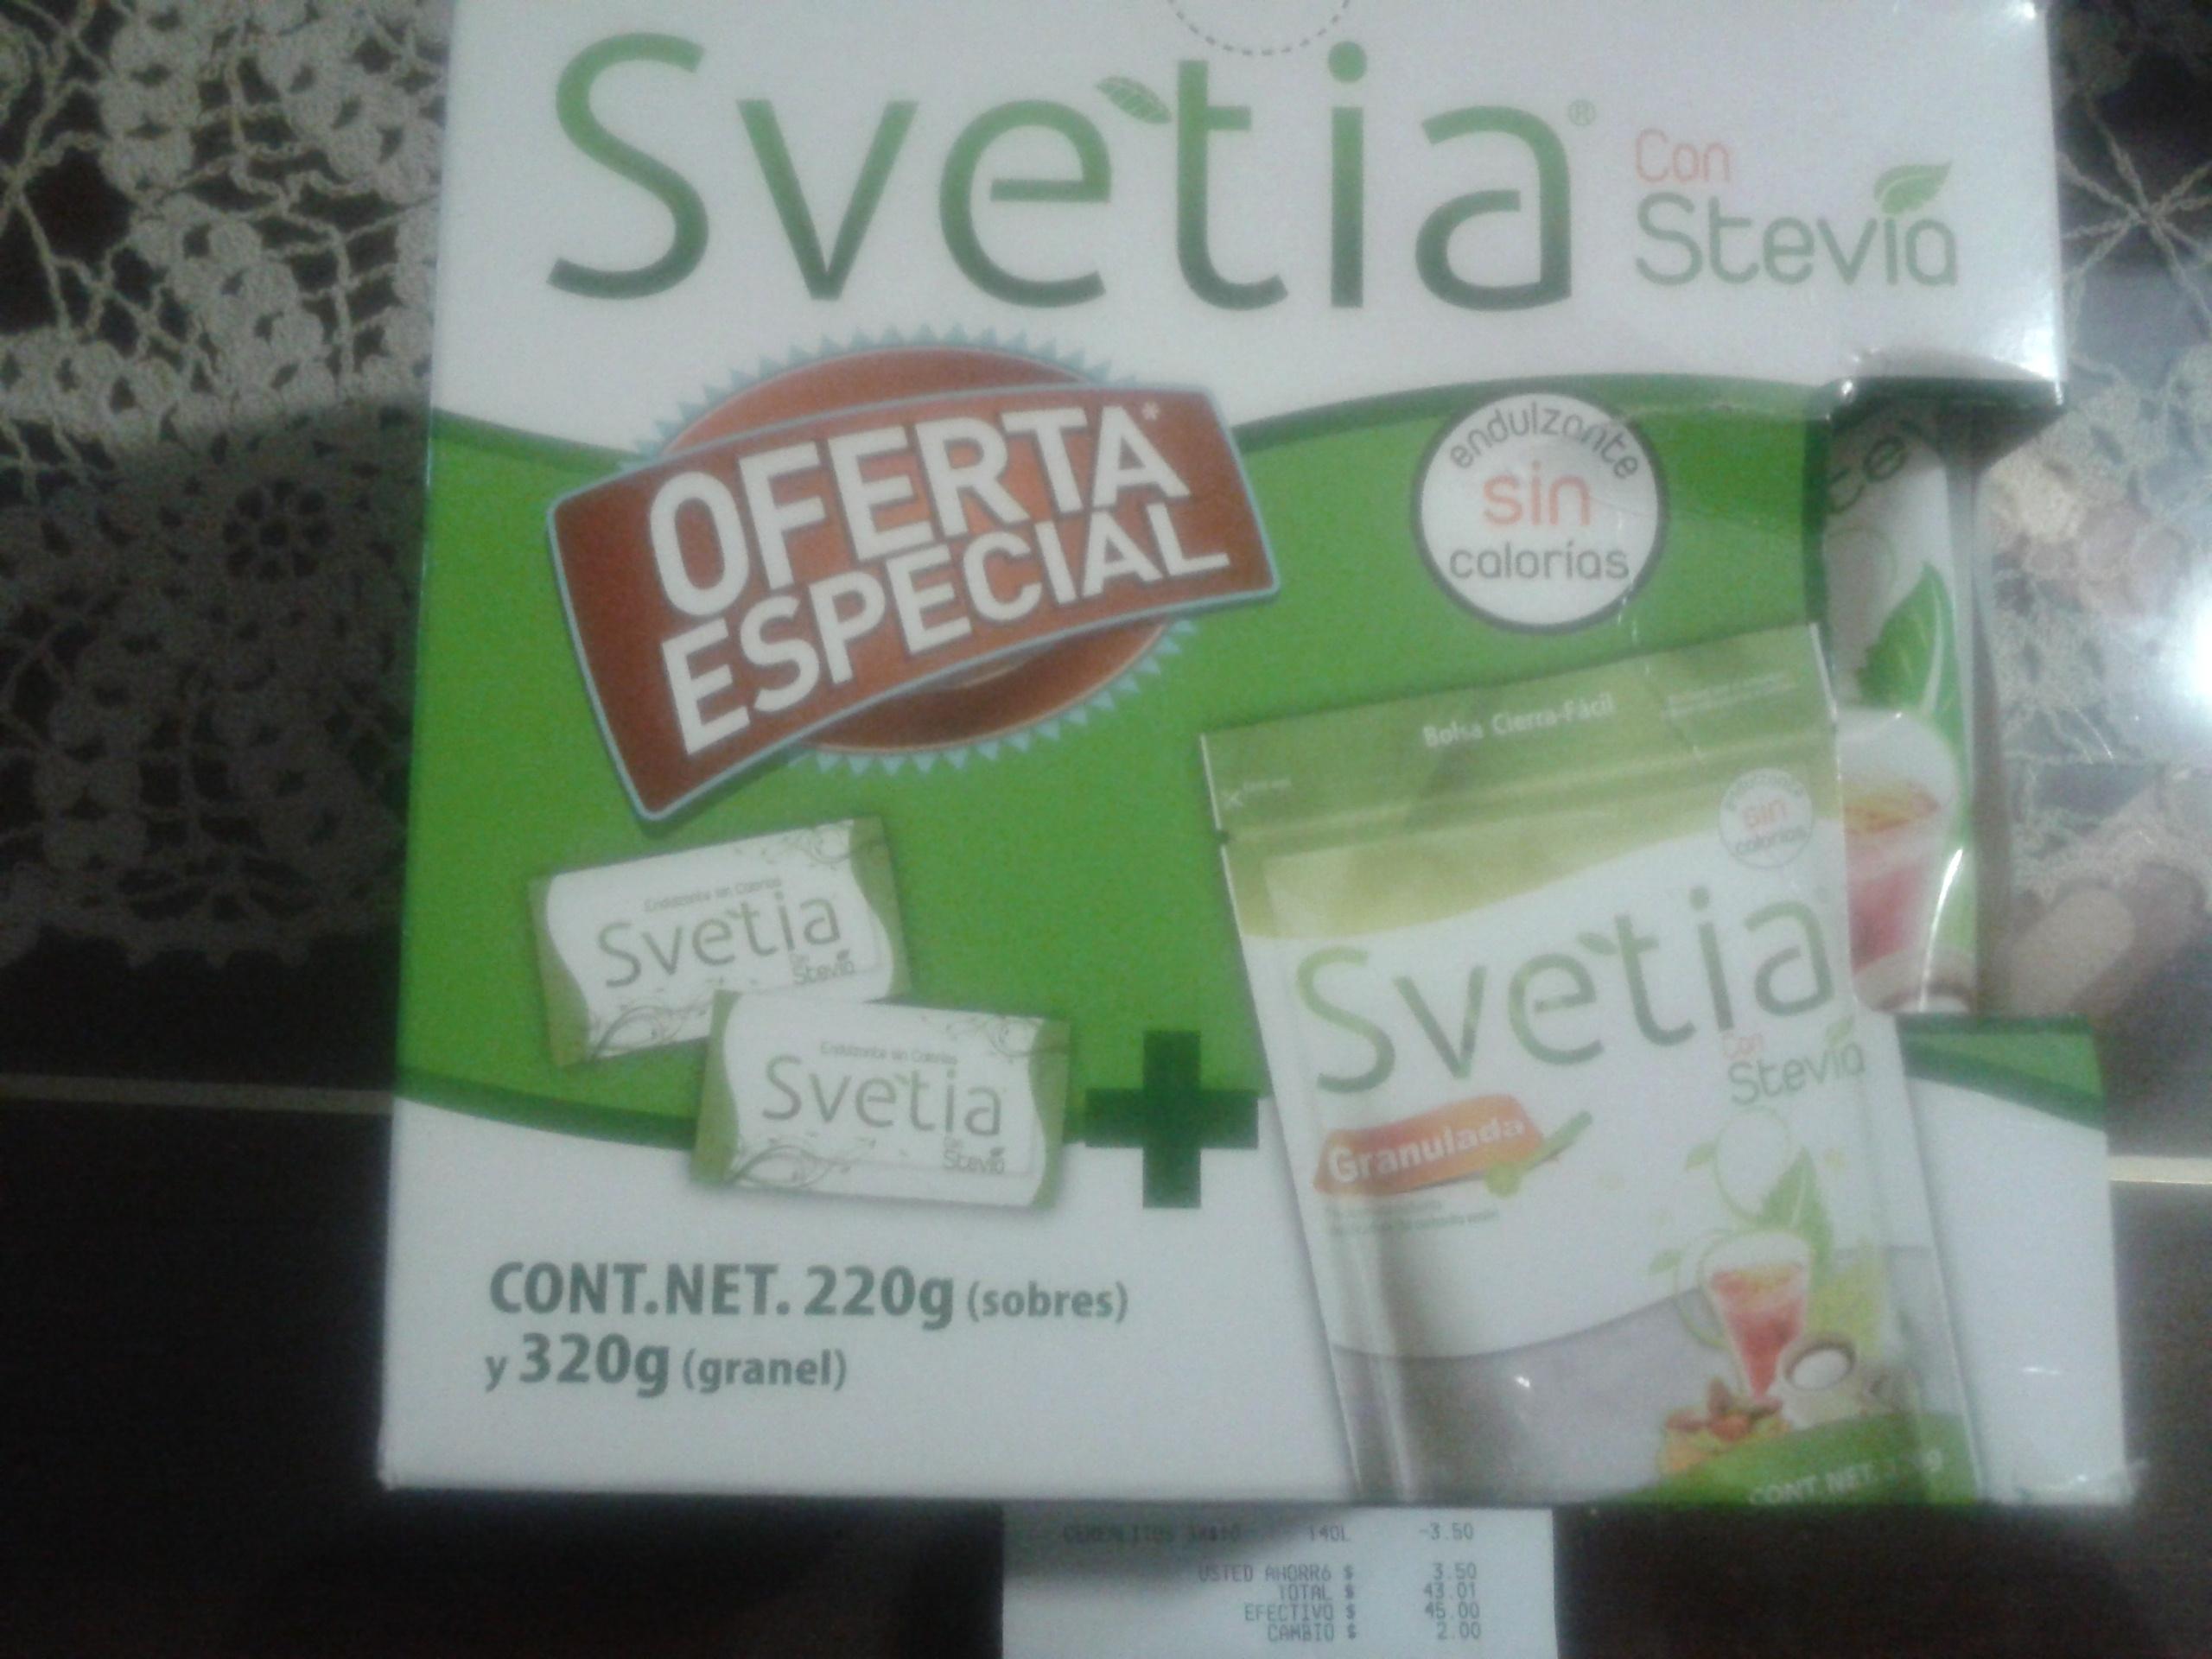 Walmart: oferta armada de Svetia en liquidación a $30.01